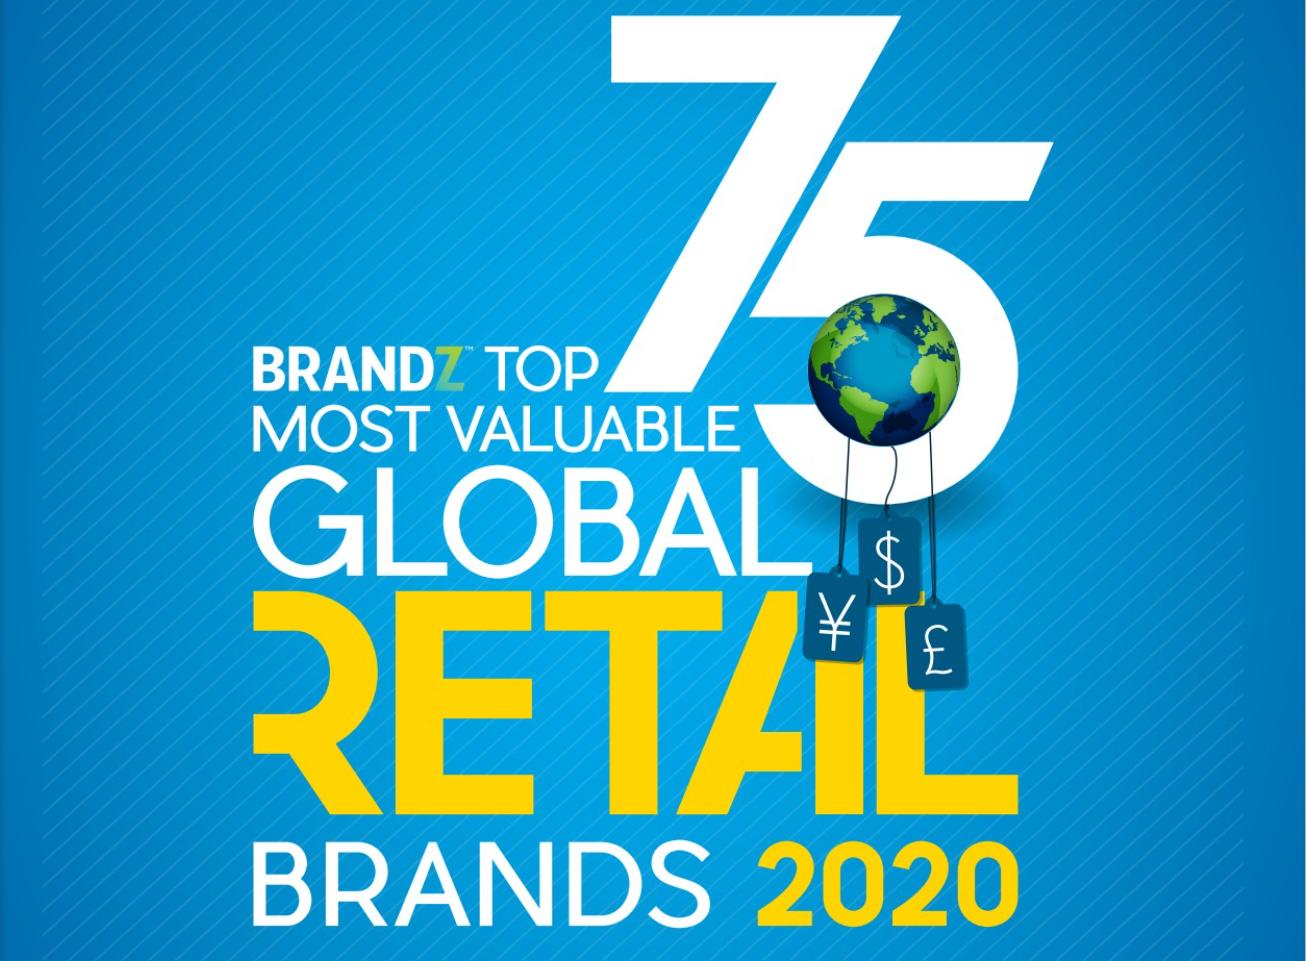 BrandZ全球零售品牌75强榜单(2020):Louis Vuitton 品牌价值超越 Nike,Lululemon 增速最快